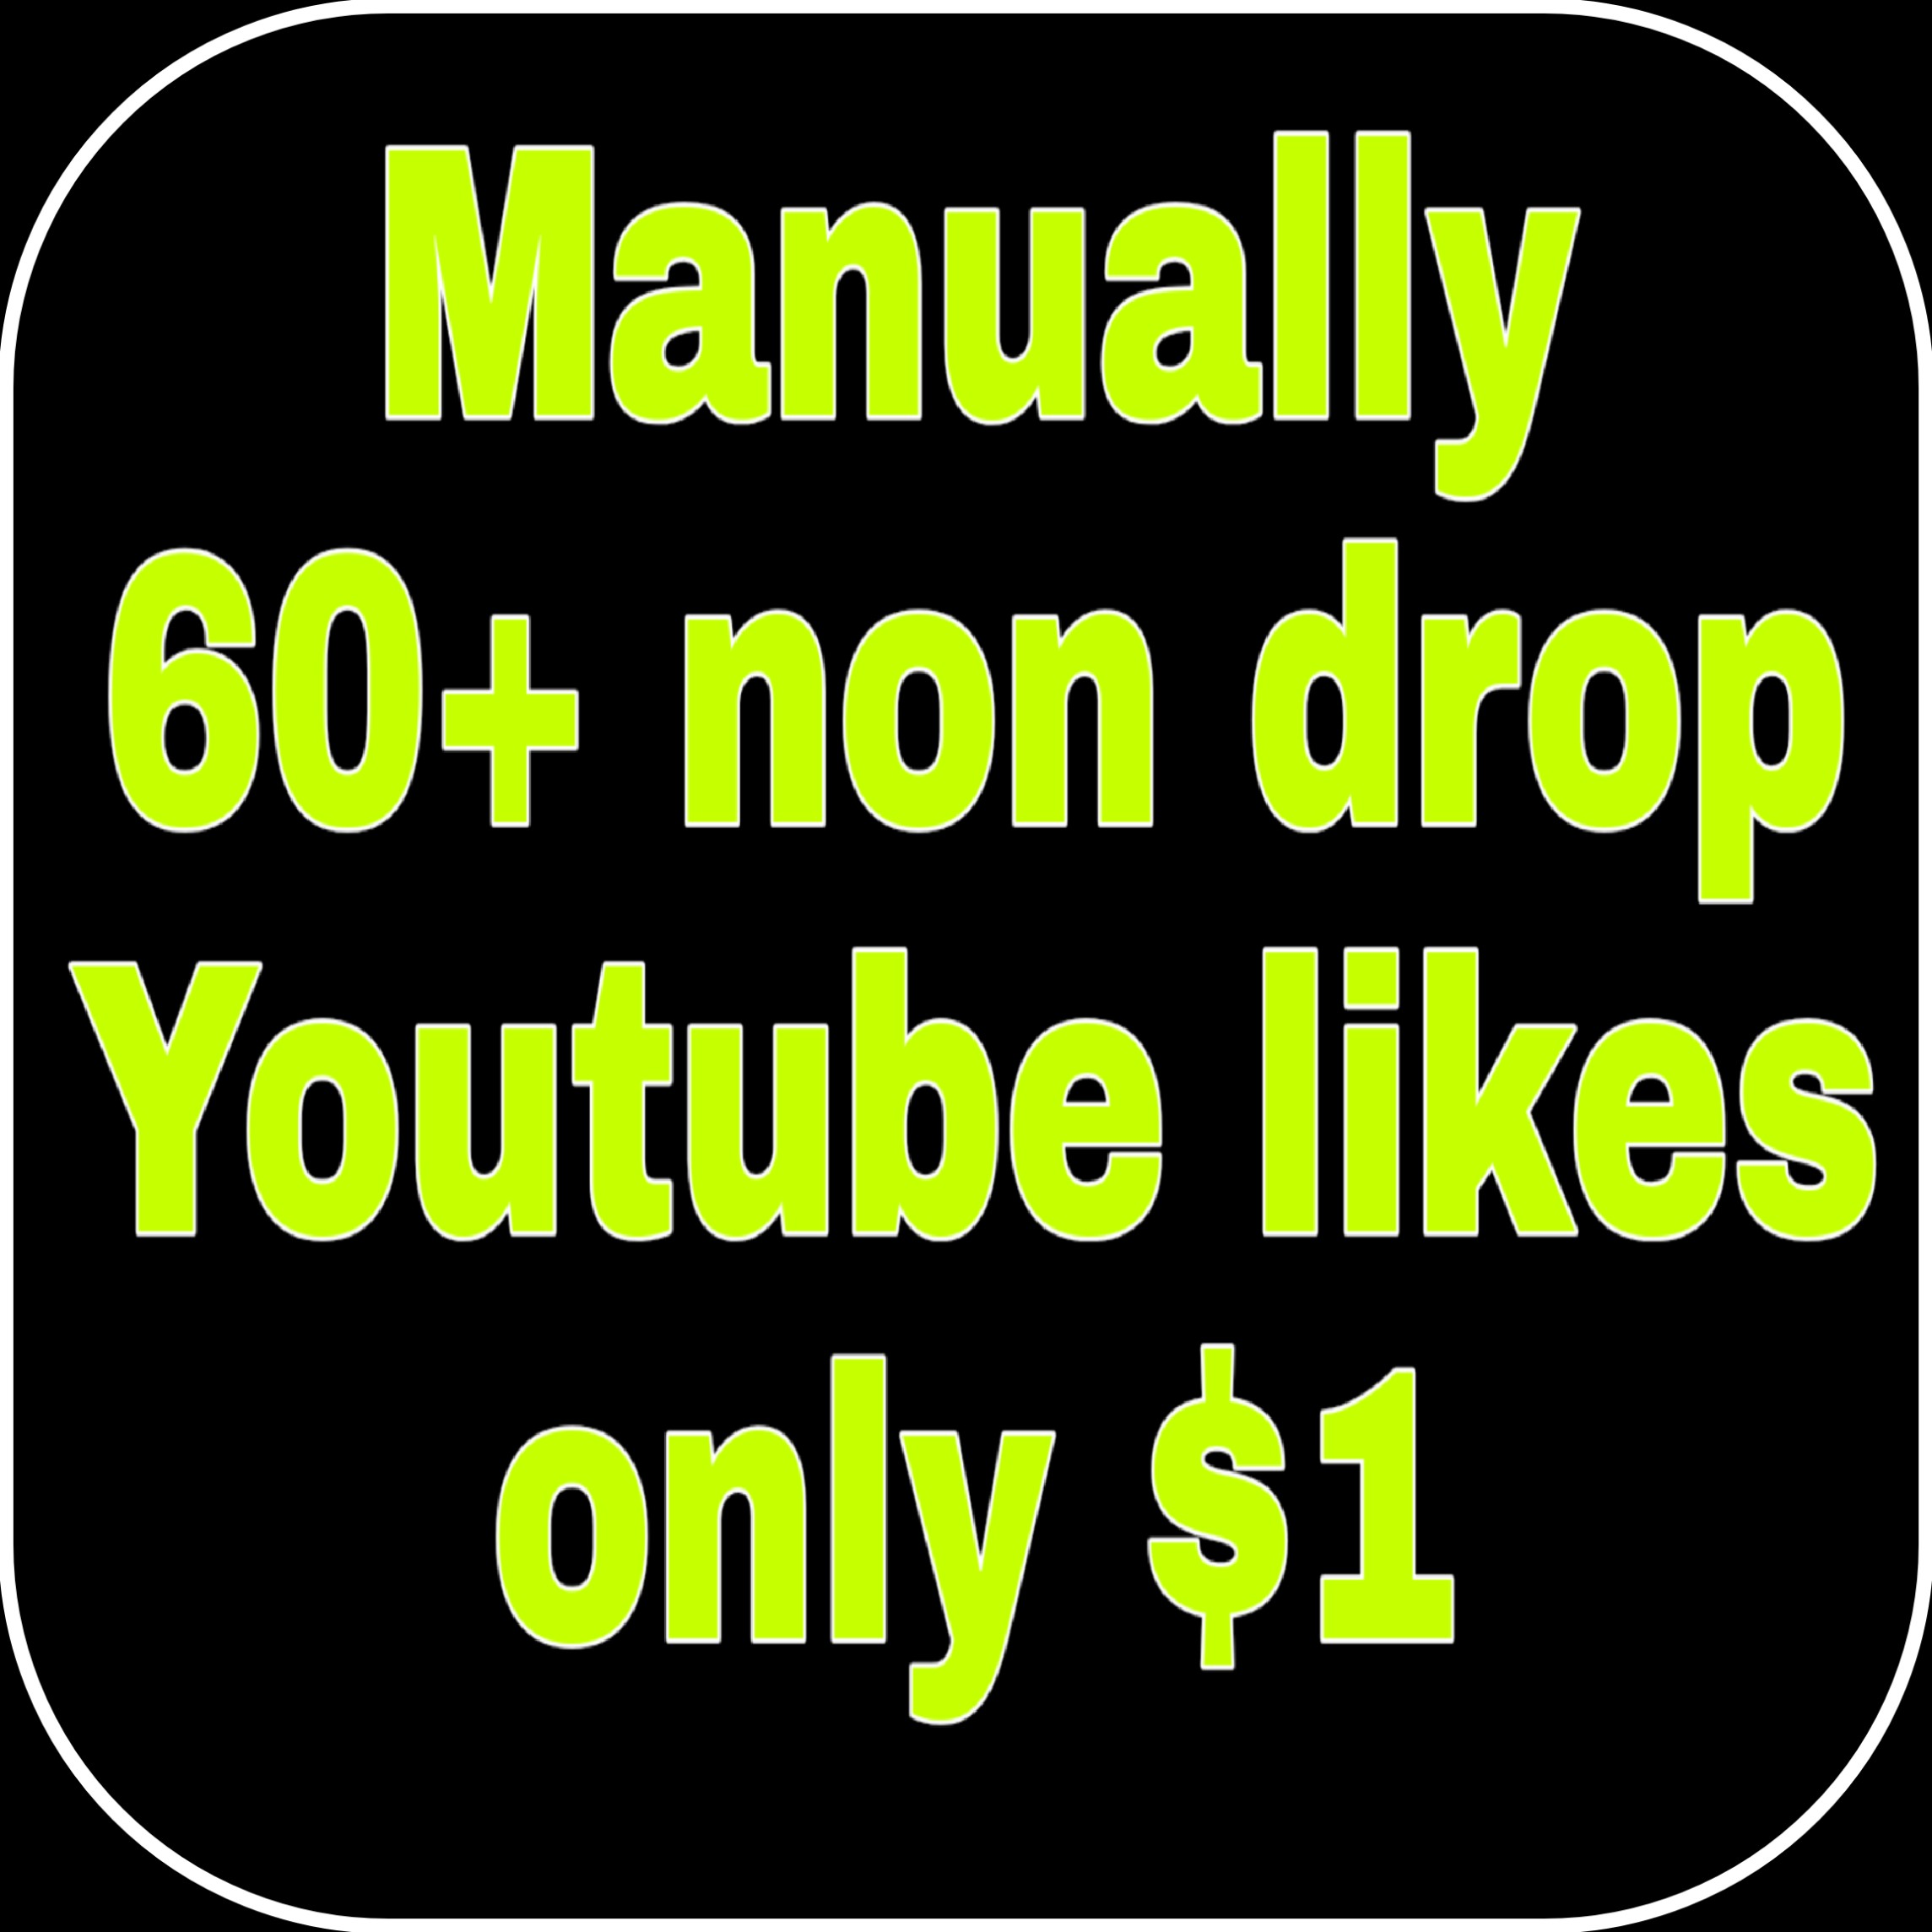 Youtube video promotion social media marketing ranks